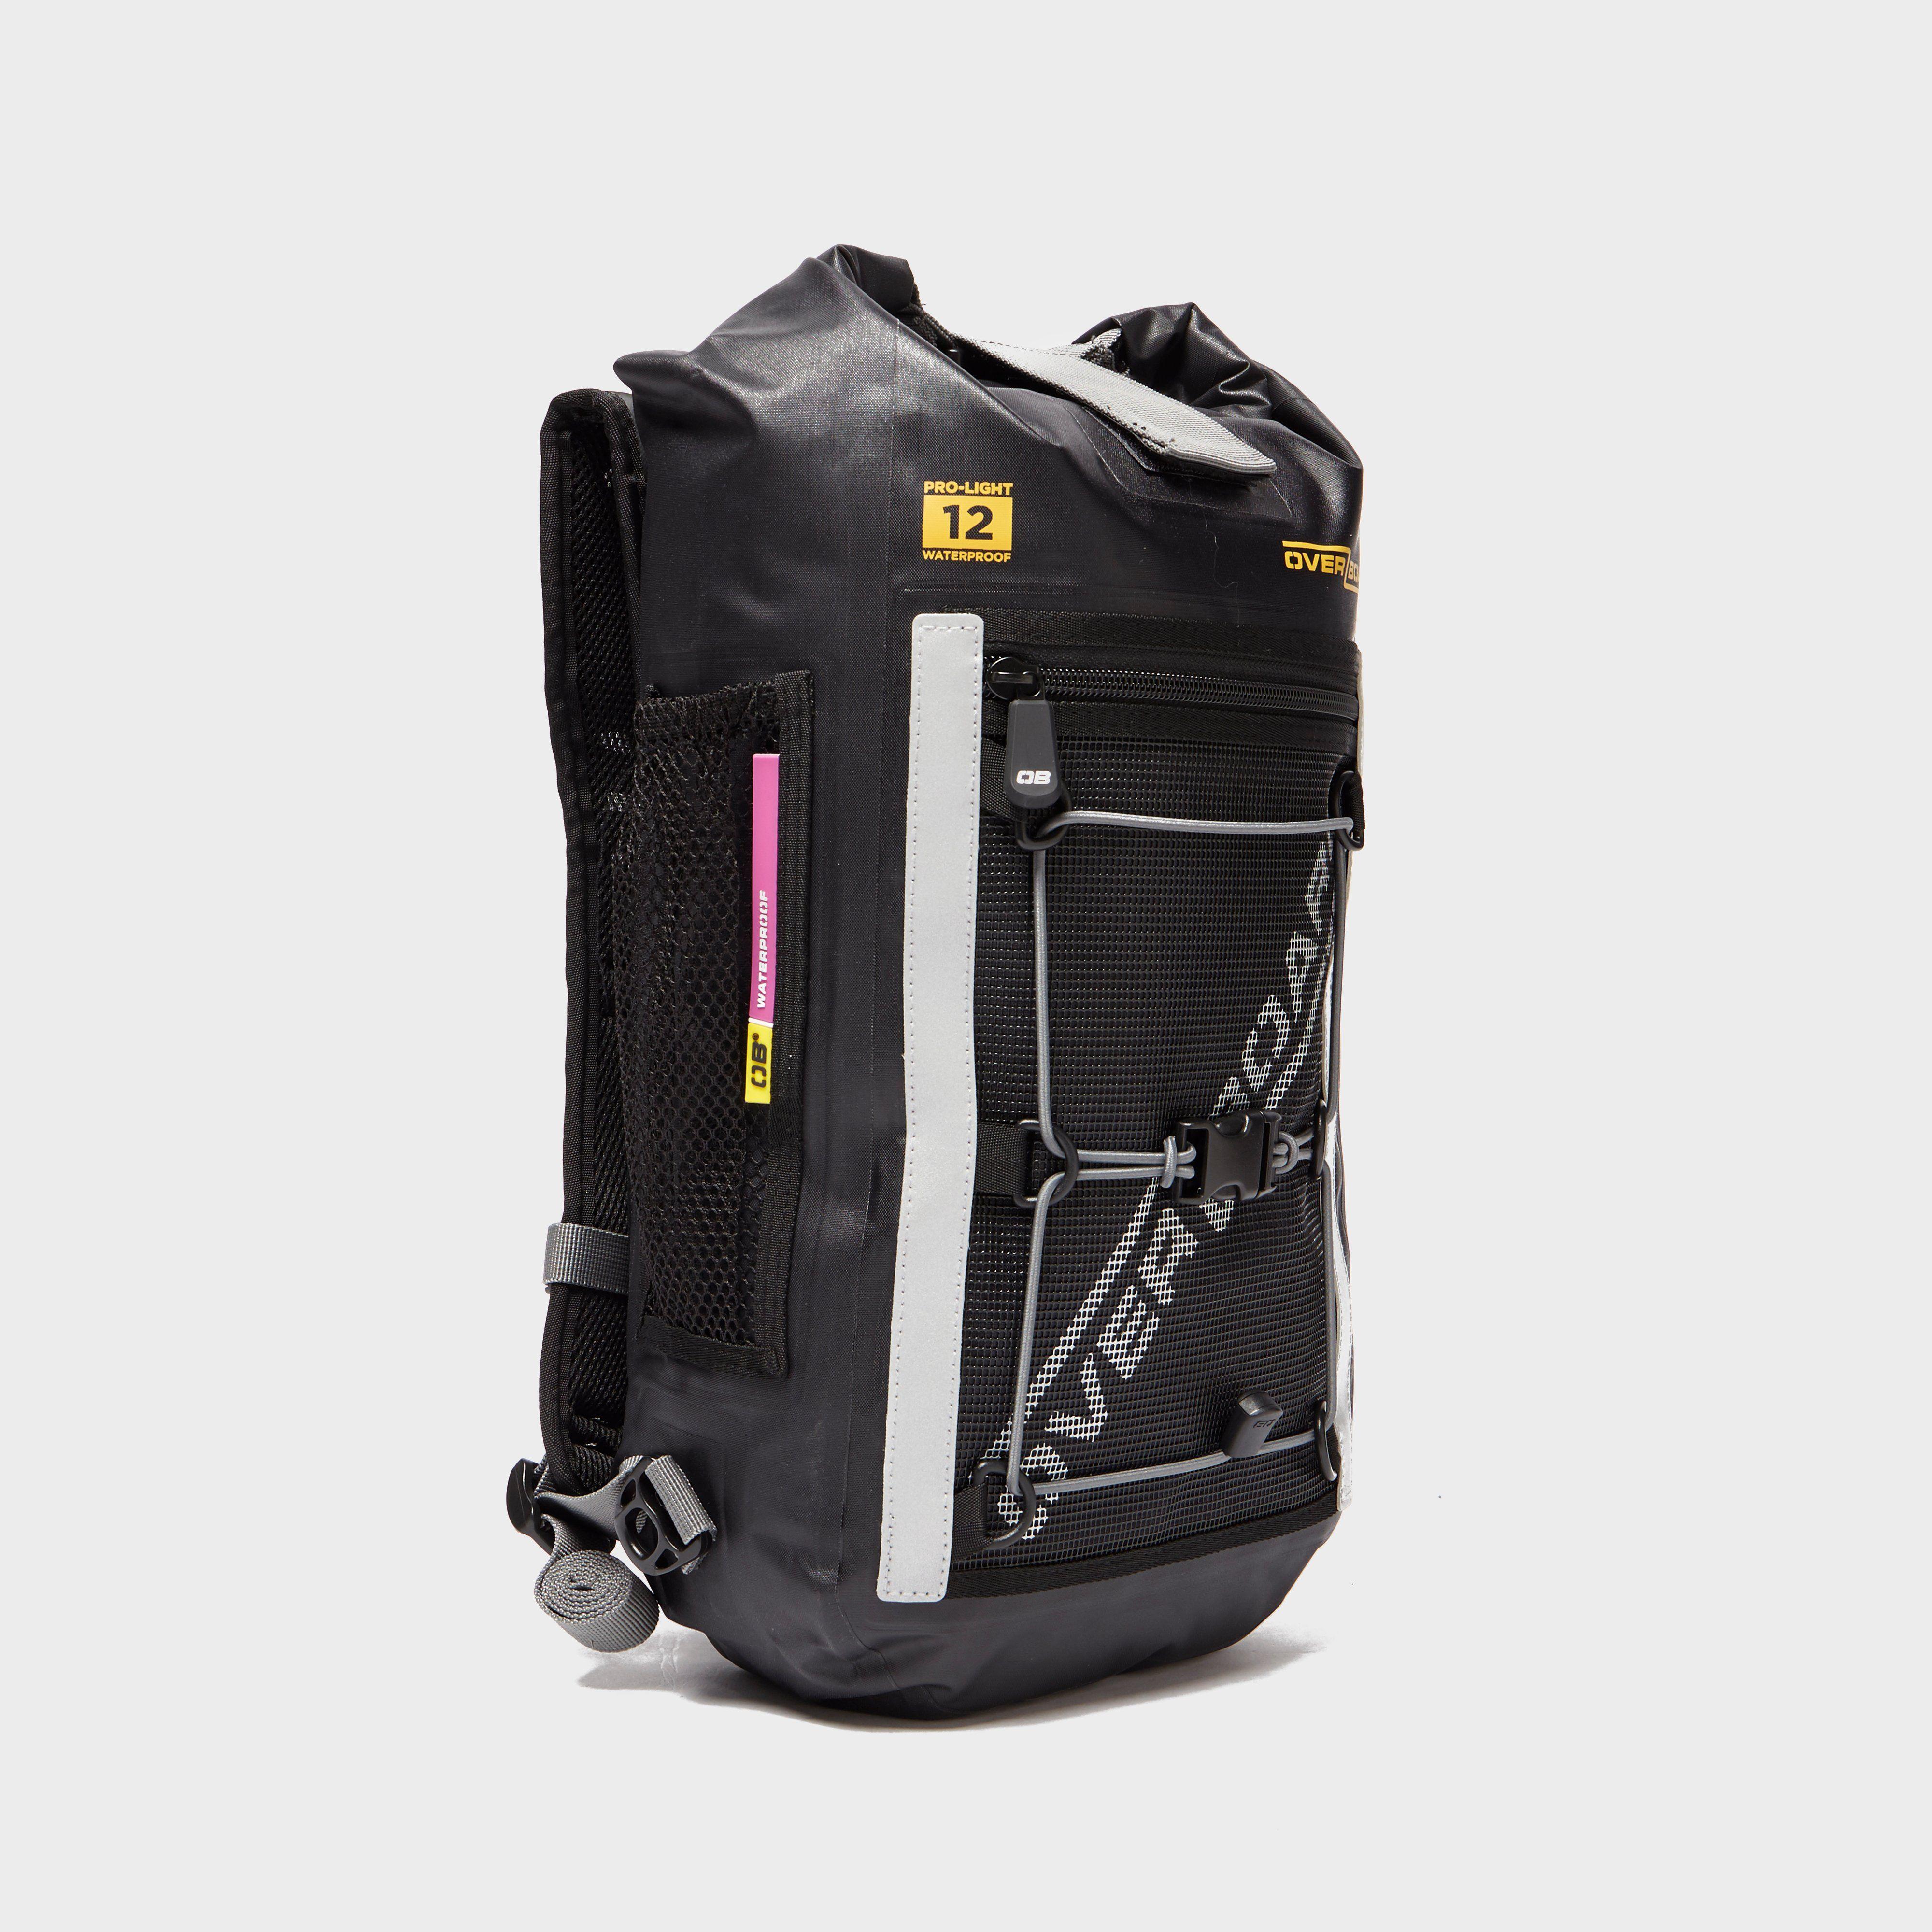 OVERBOARD Pro-Light 12L Waterproof Pack